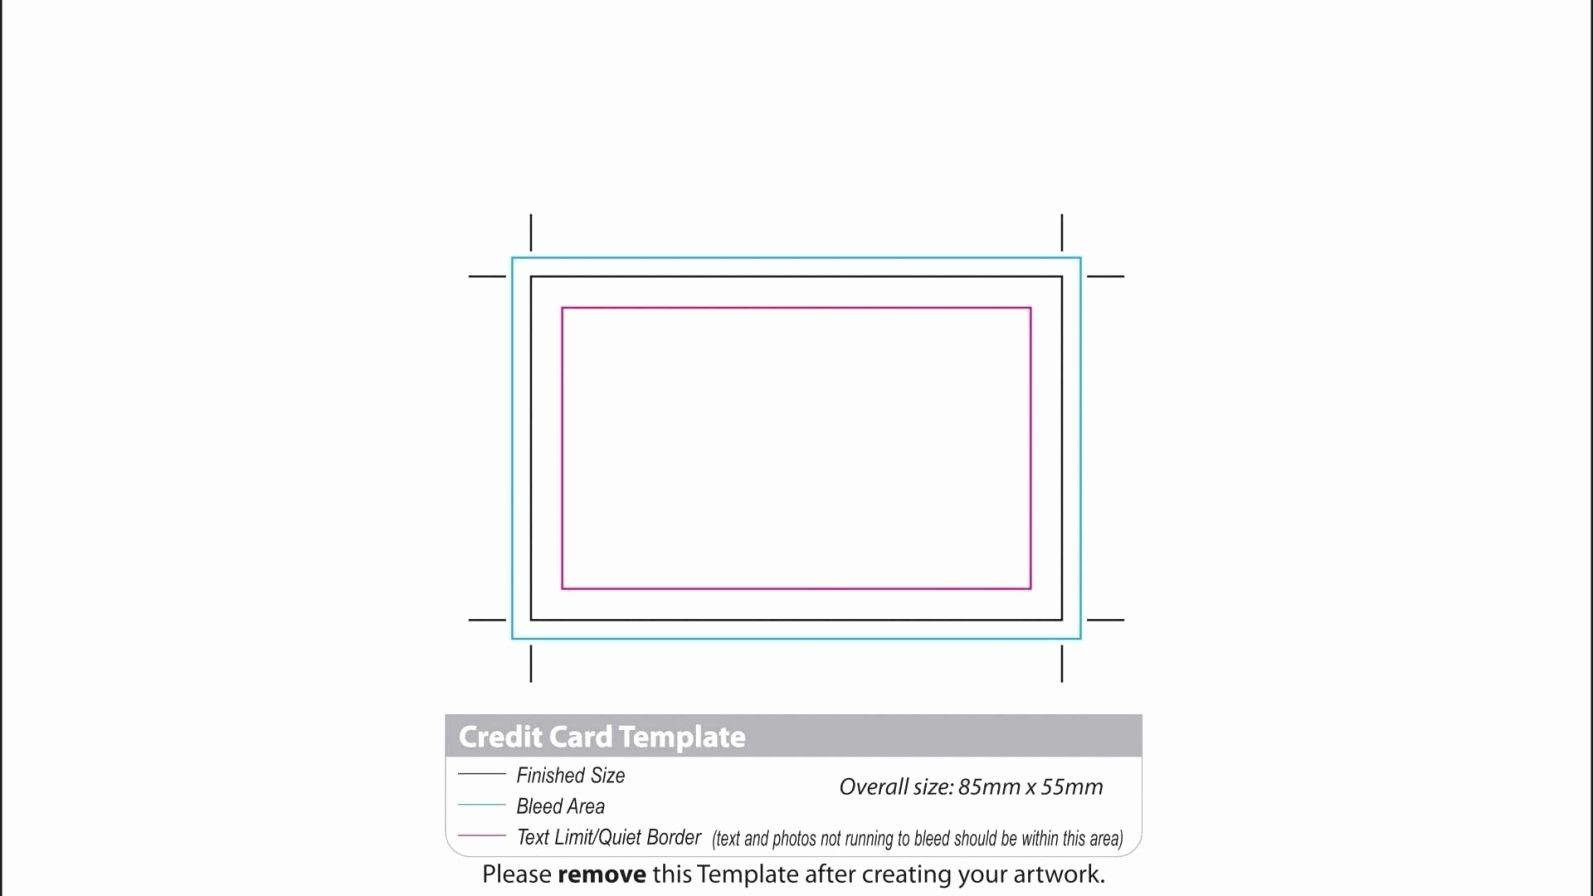 Blank Business Card Template Psd Lovely Blank Business Card Templates 30 Best Blank B Vistaprint Business Cards Blank Business Cards Business Card Template Psd